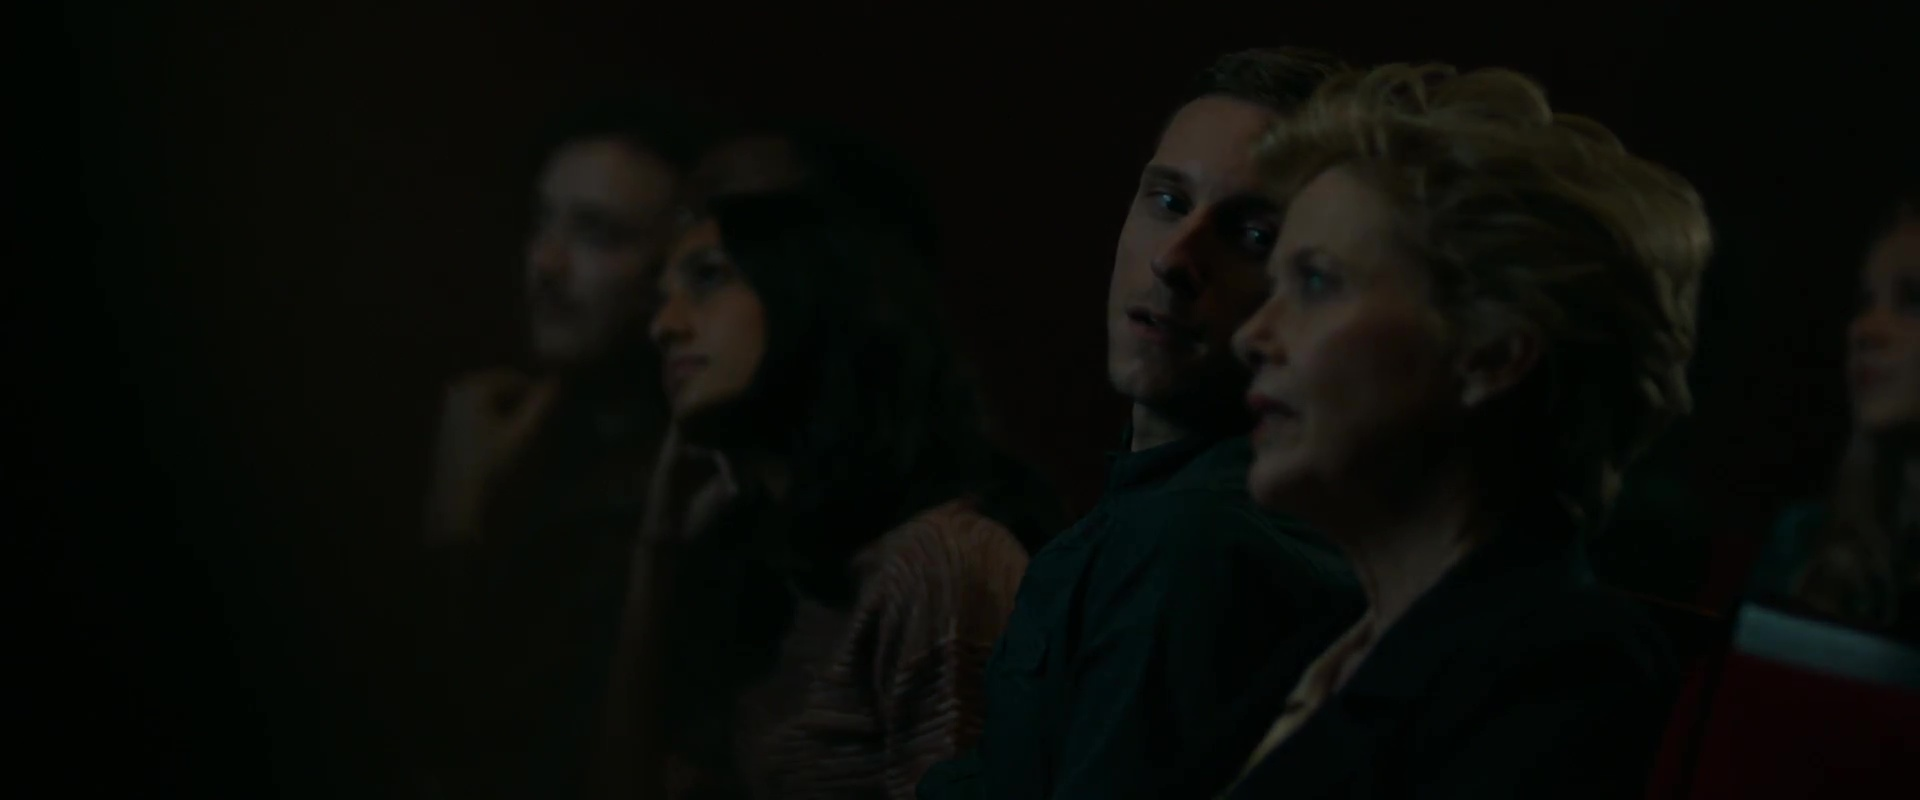 Film Stars Don't Die in Liverpool film still 4